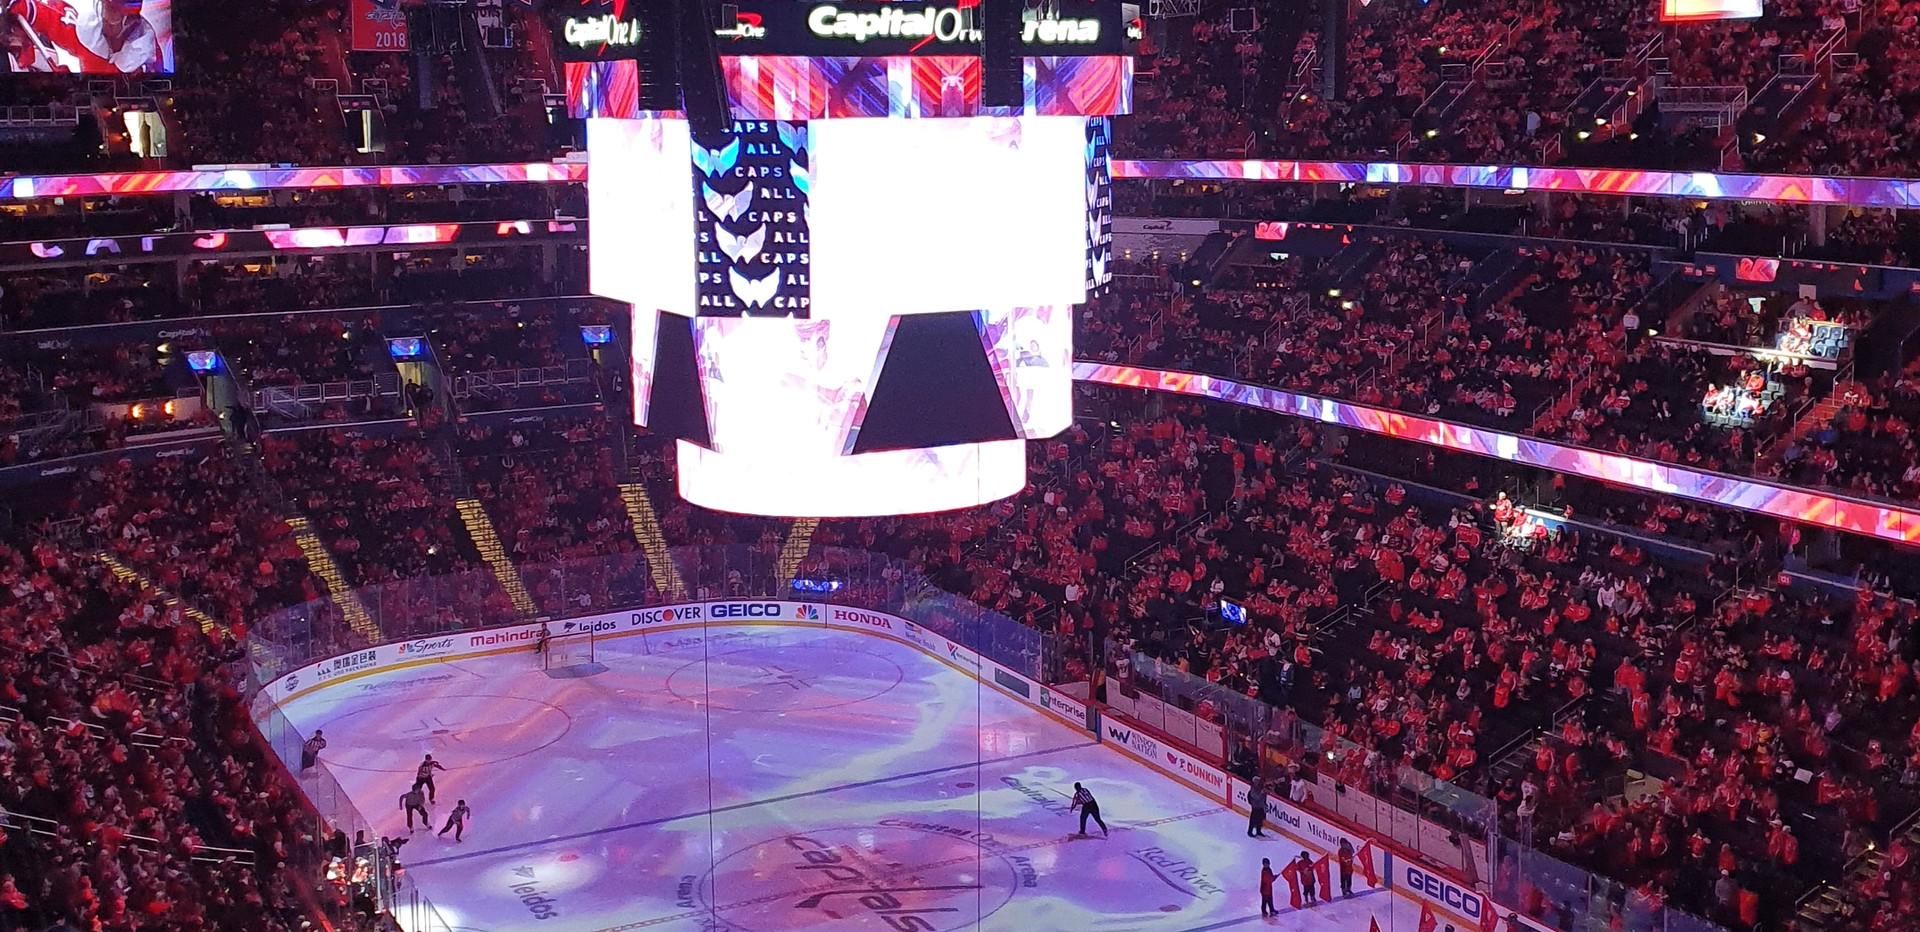 Washington Capitals x Pittsburgh Penguins